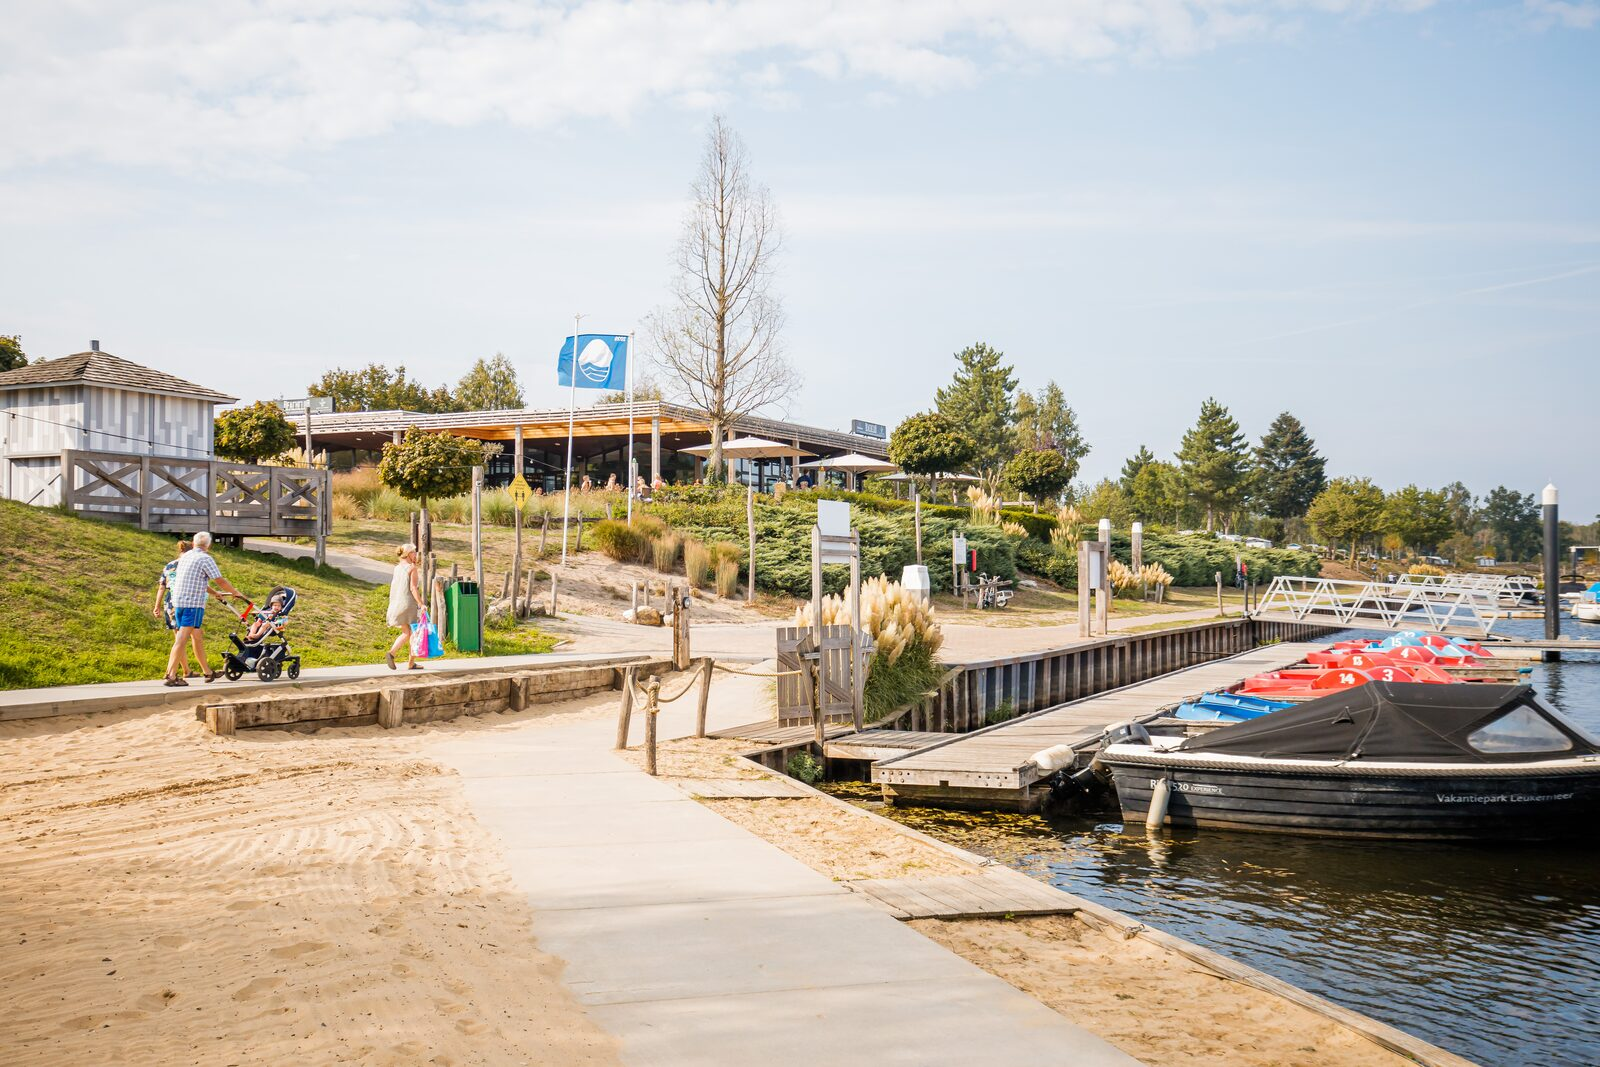 Campsite with marina